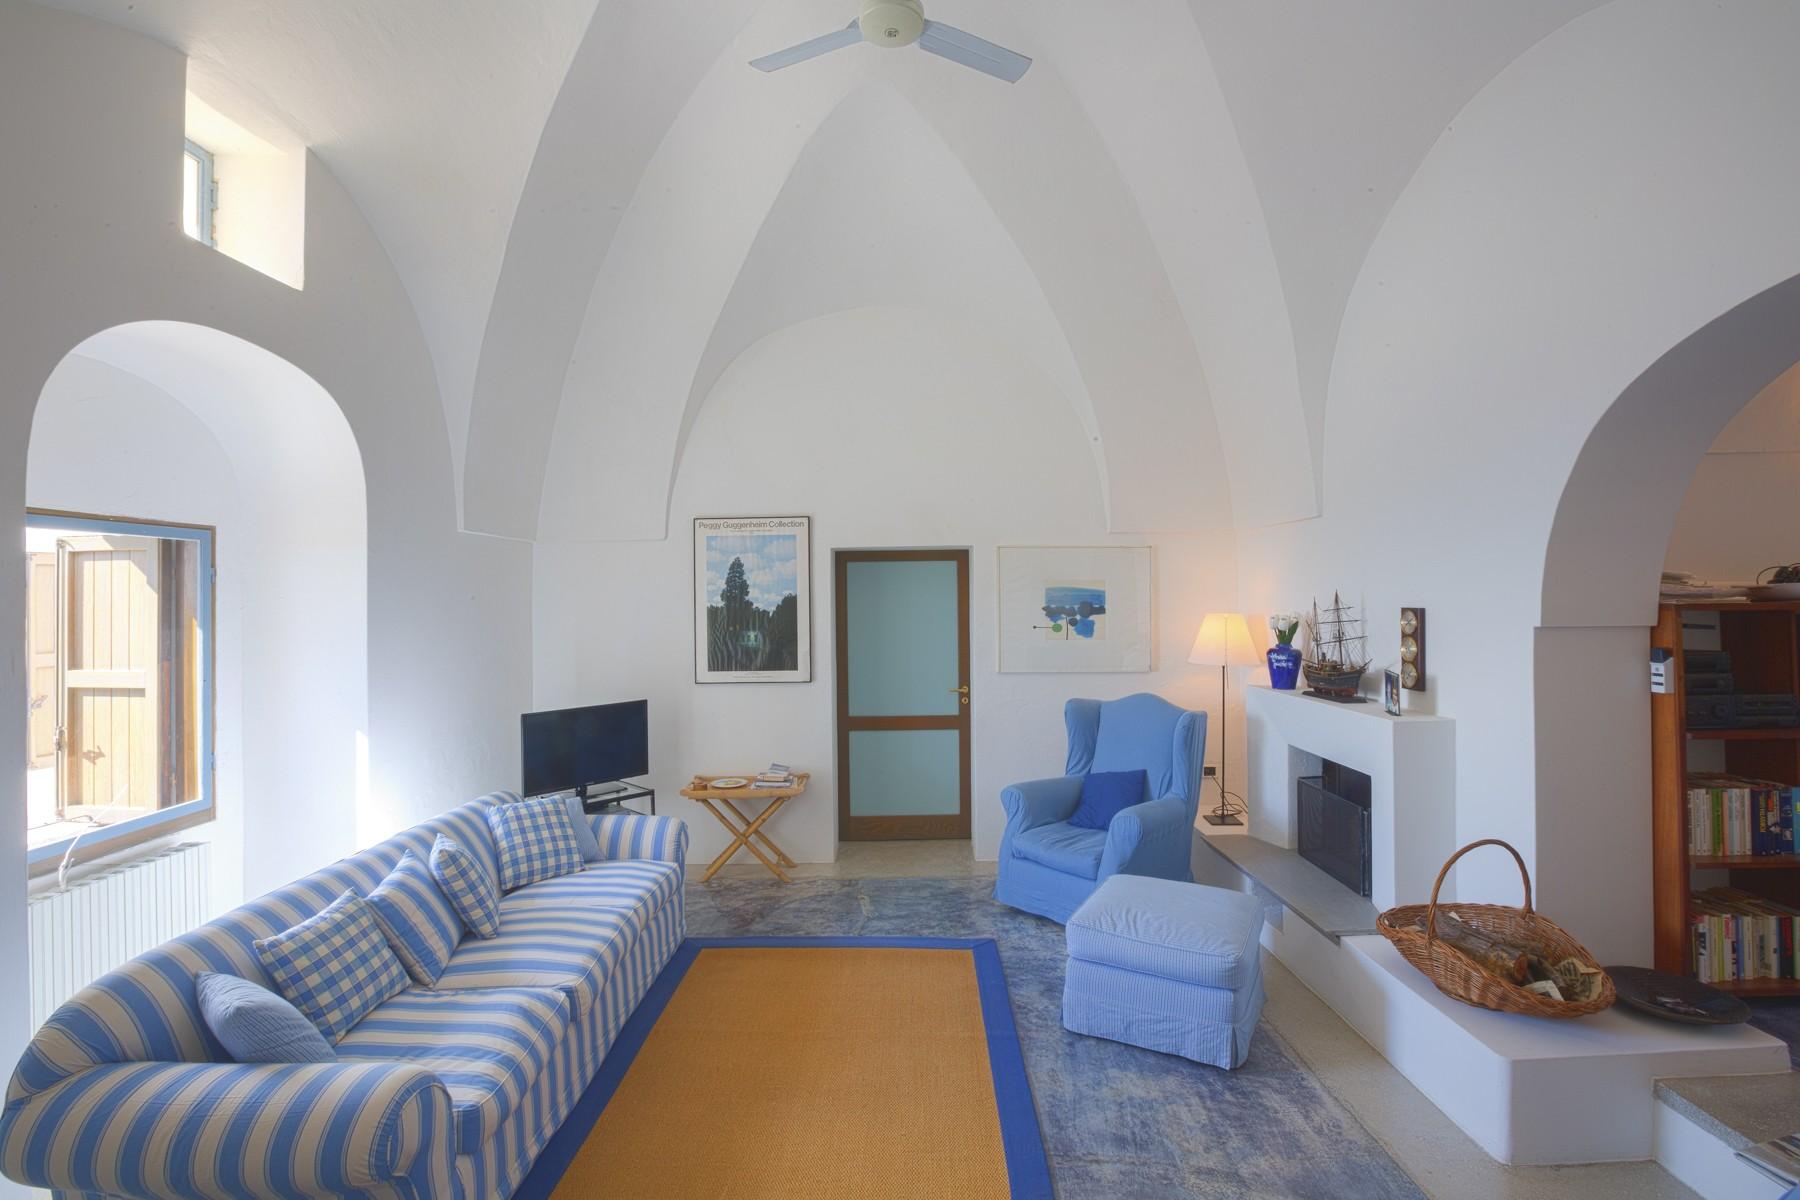 Villa in Vendita a Pantelleria: 5 locali, 530 mq - Foto 10